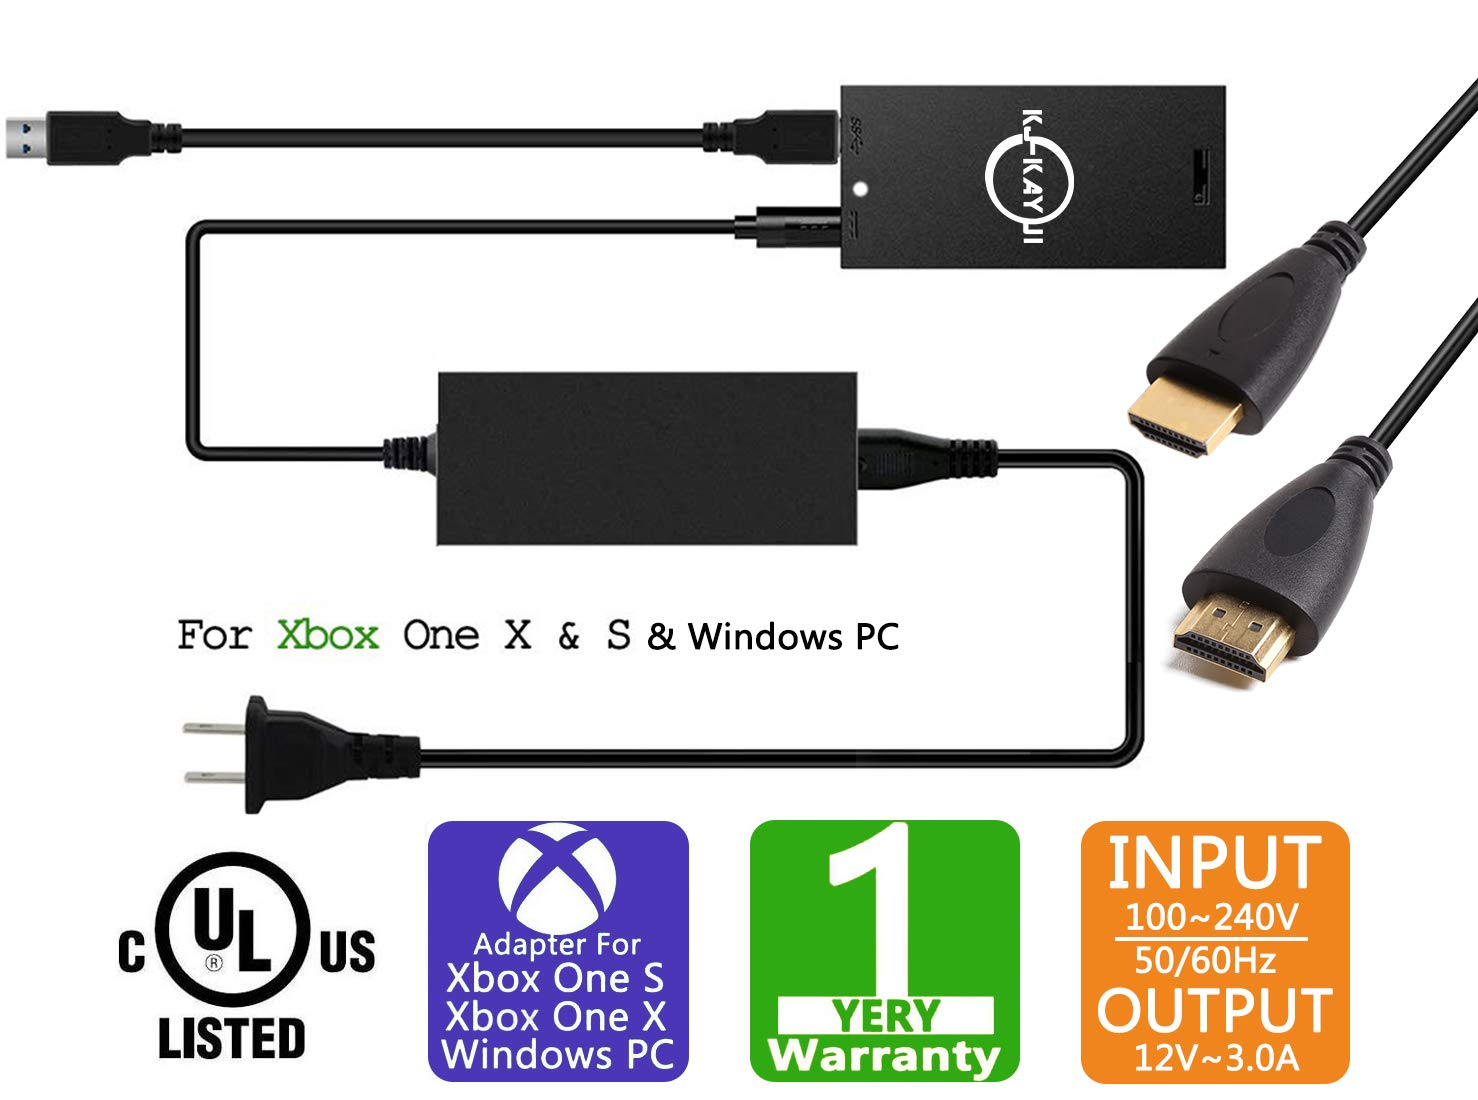 Xbox One Kinect Adapter for Xbox One S/Xbox One X/Windows PC,Windows PC Adapter Power Supply for Xbox One S/X kinect 2.0 Sensor,Connect to Windows PC Via USB 3.0,Windows Interactive APP Program Develo